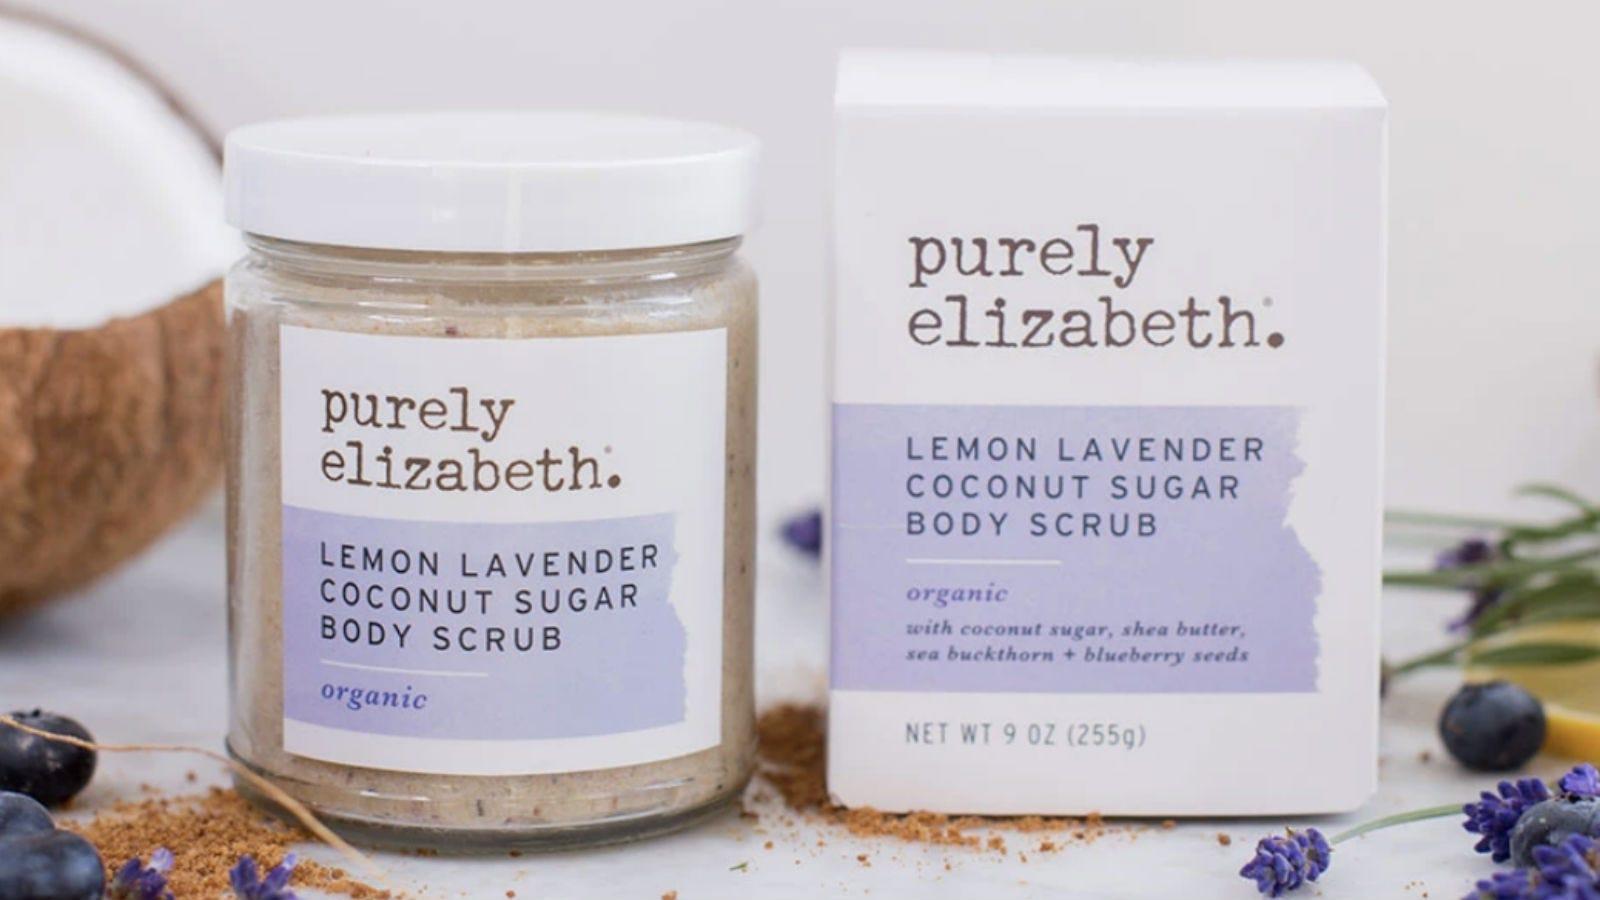 Purely Elizabeth Lemon Lavender Coconut Sugar Body Scrub